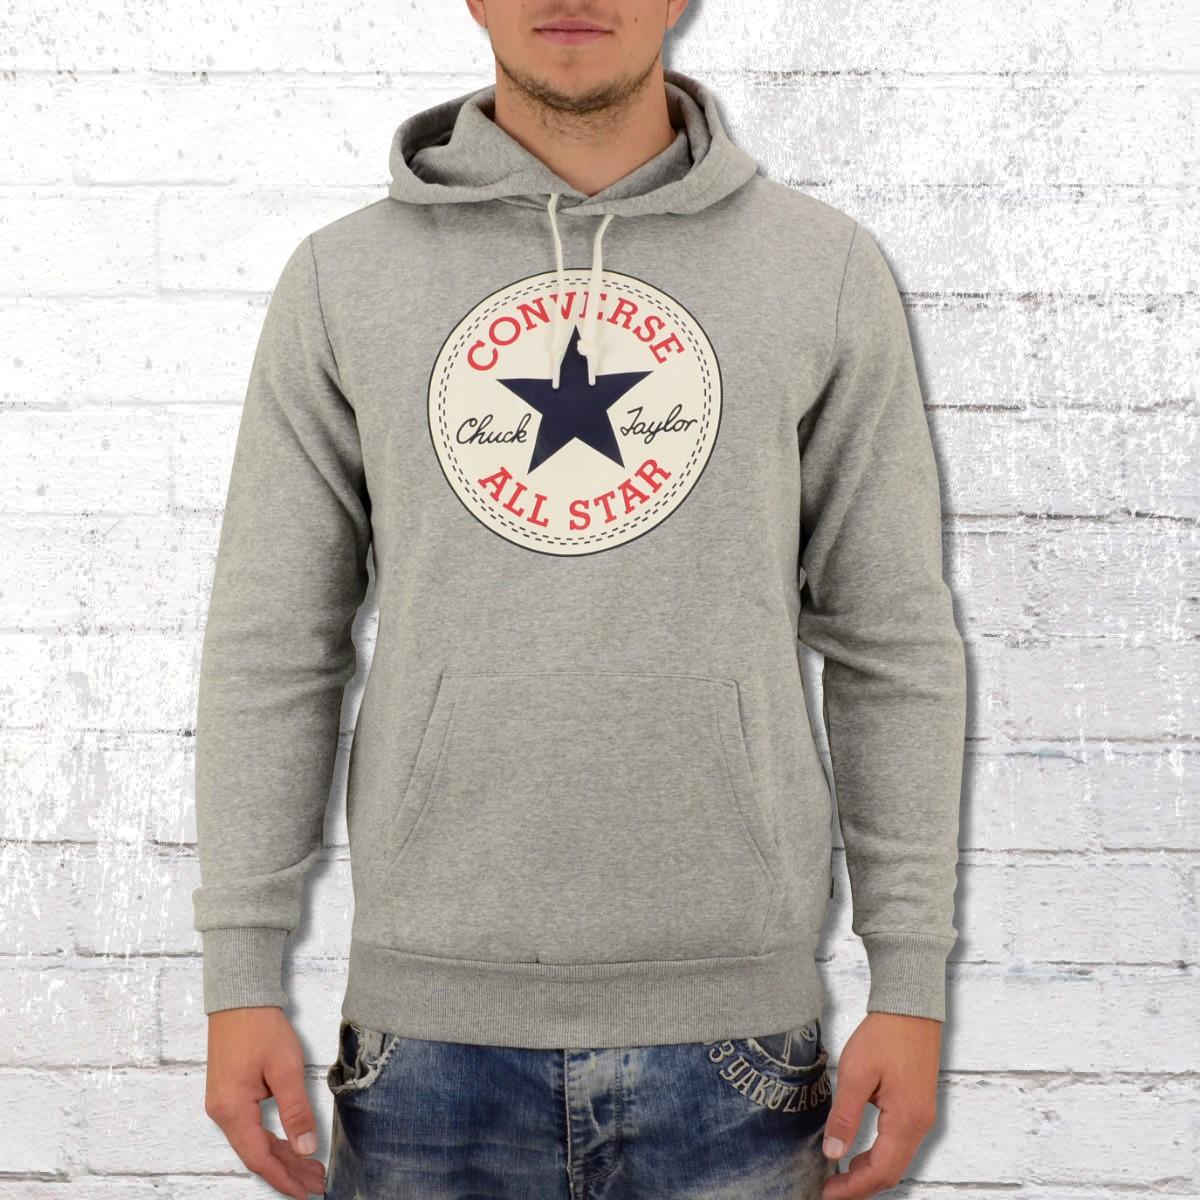 all star converse jacket